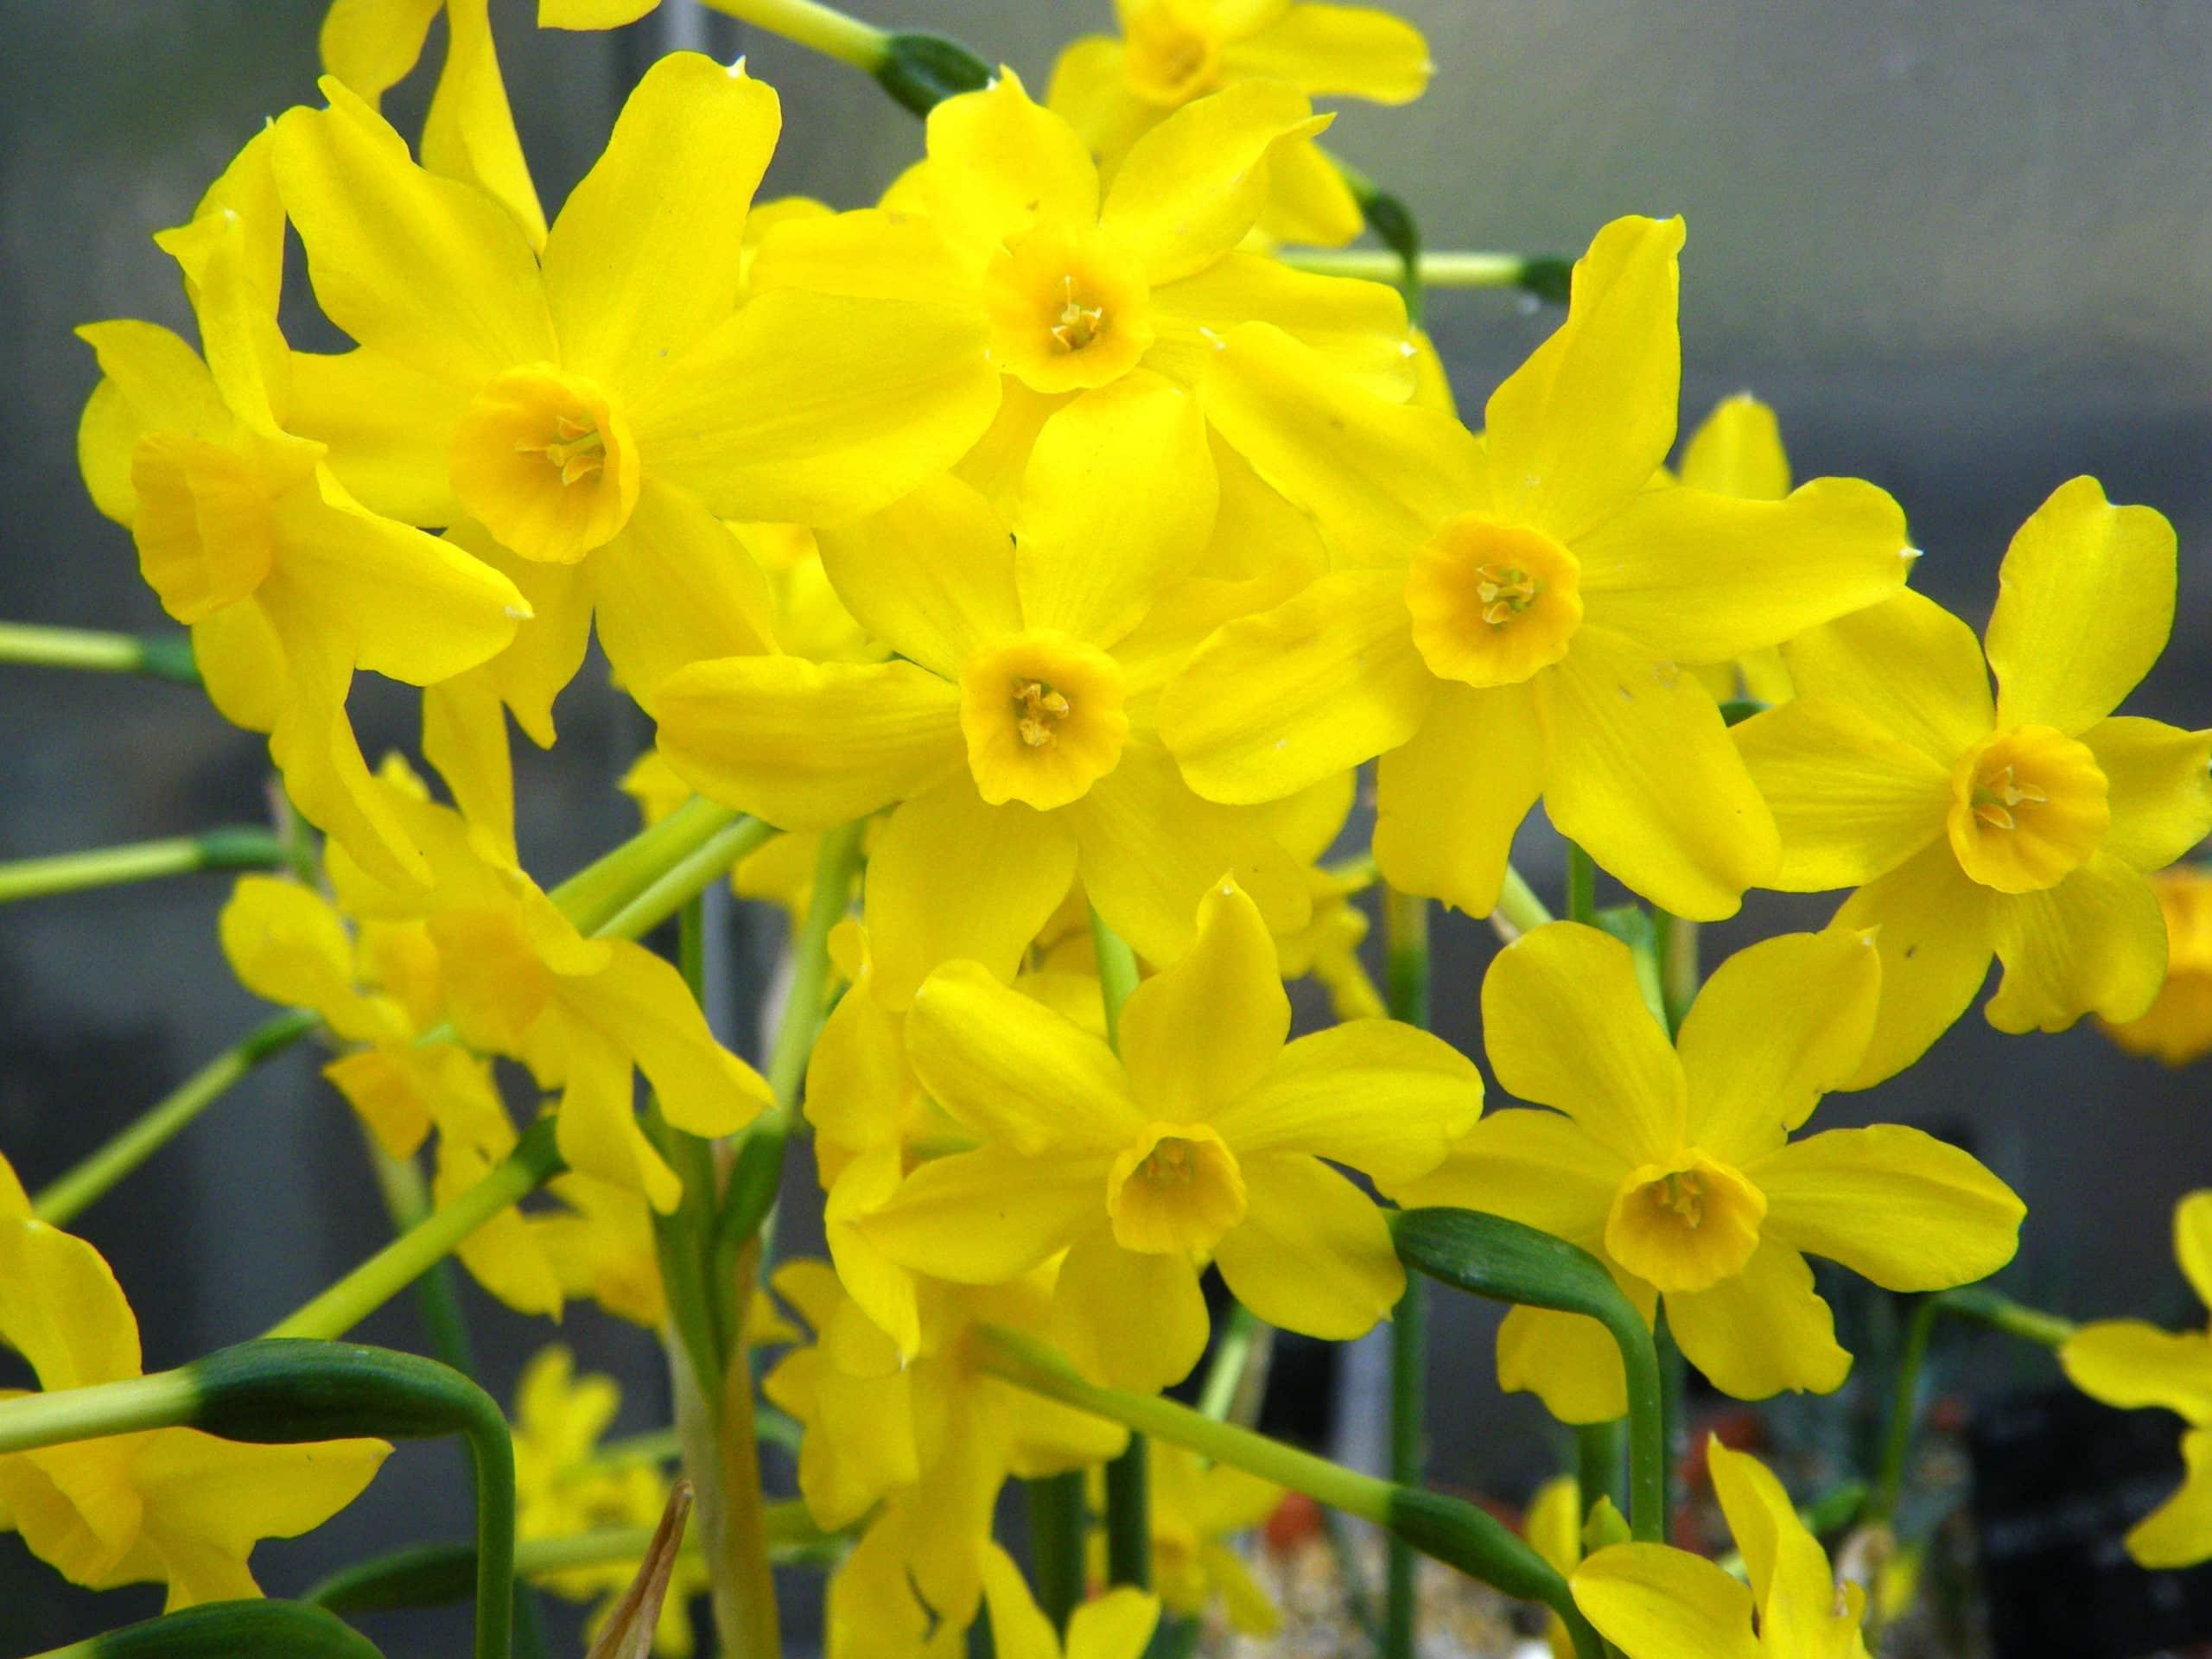 Jonquil. (Narcissus).